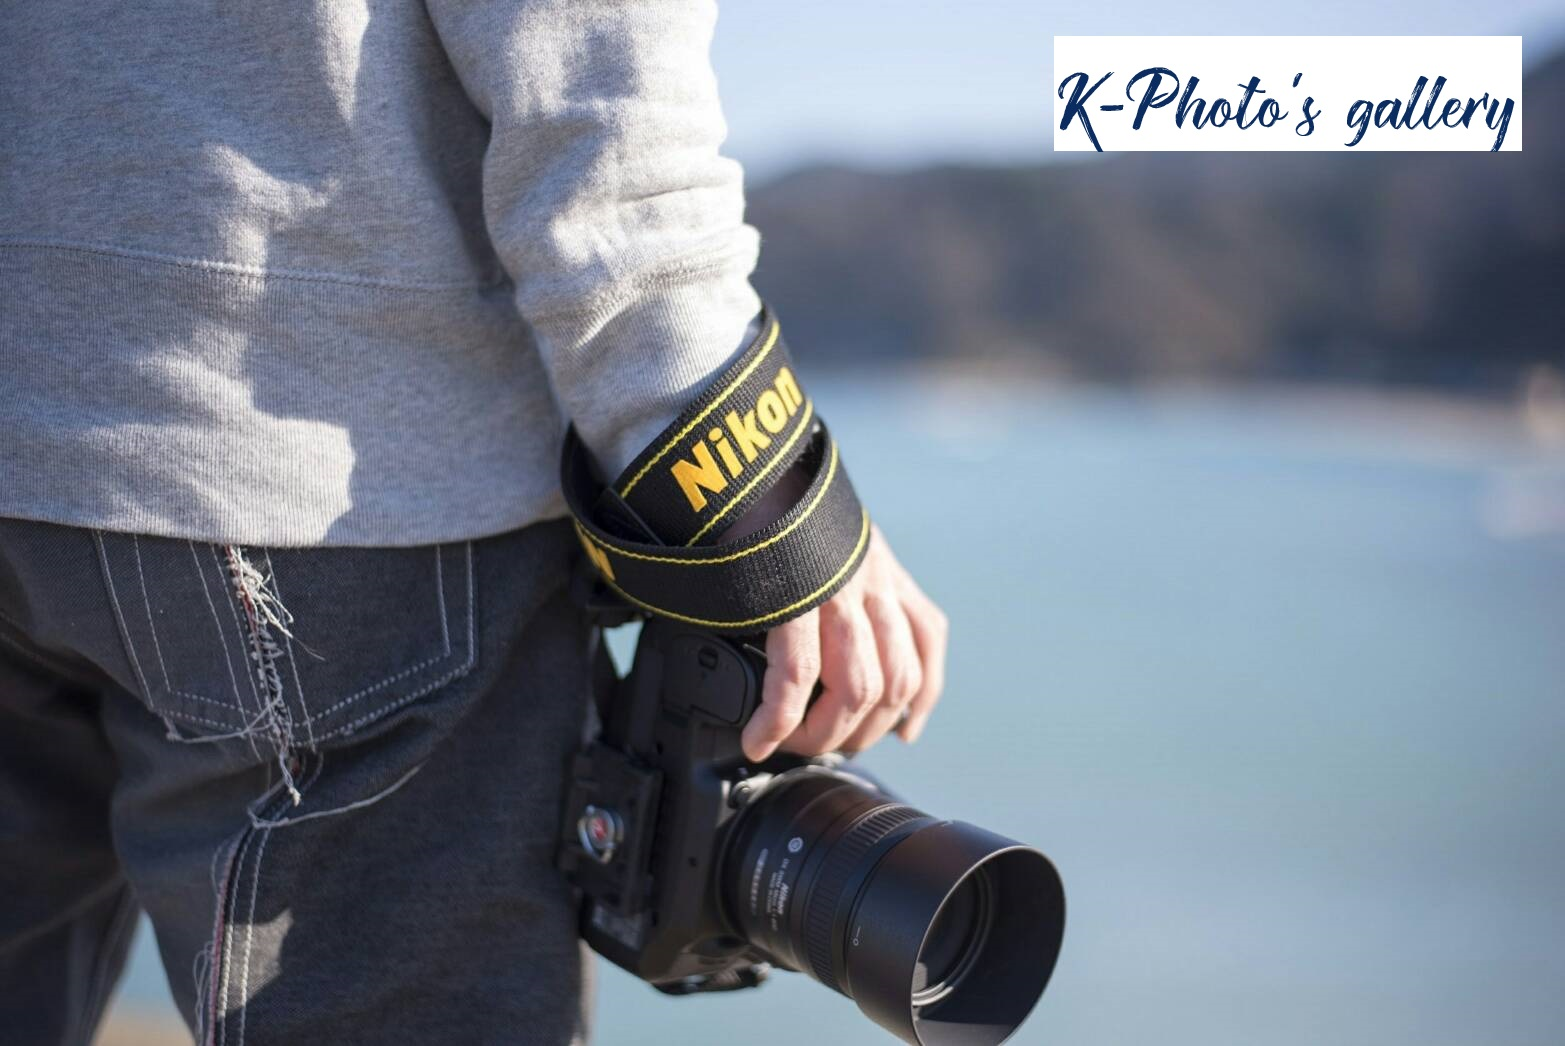 K-Photo's gallery